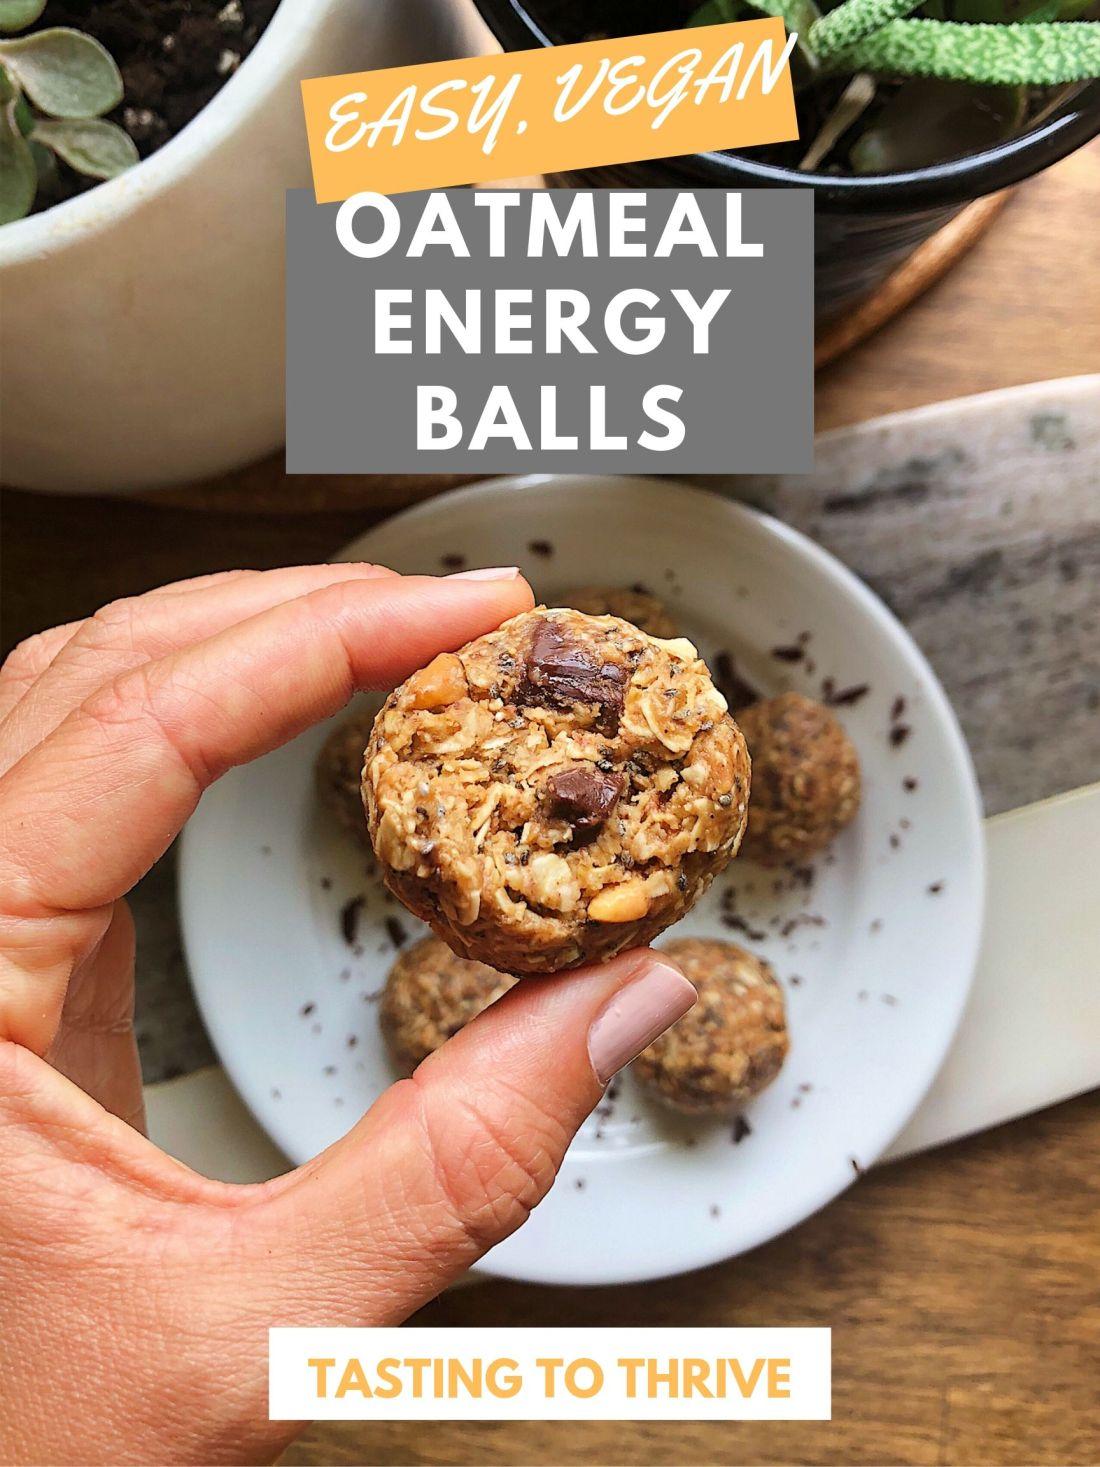 Hand holding easy oatmeal energy balls